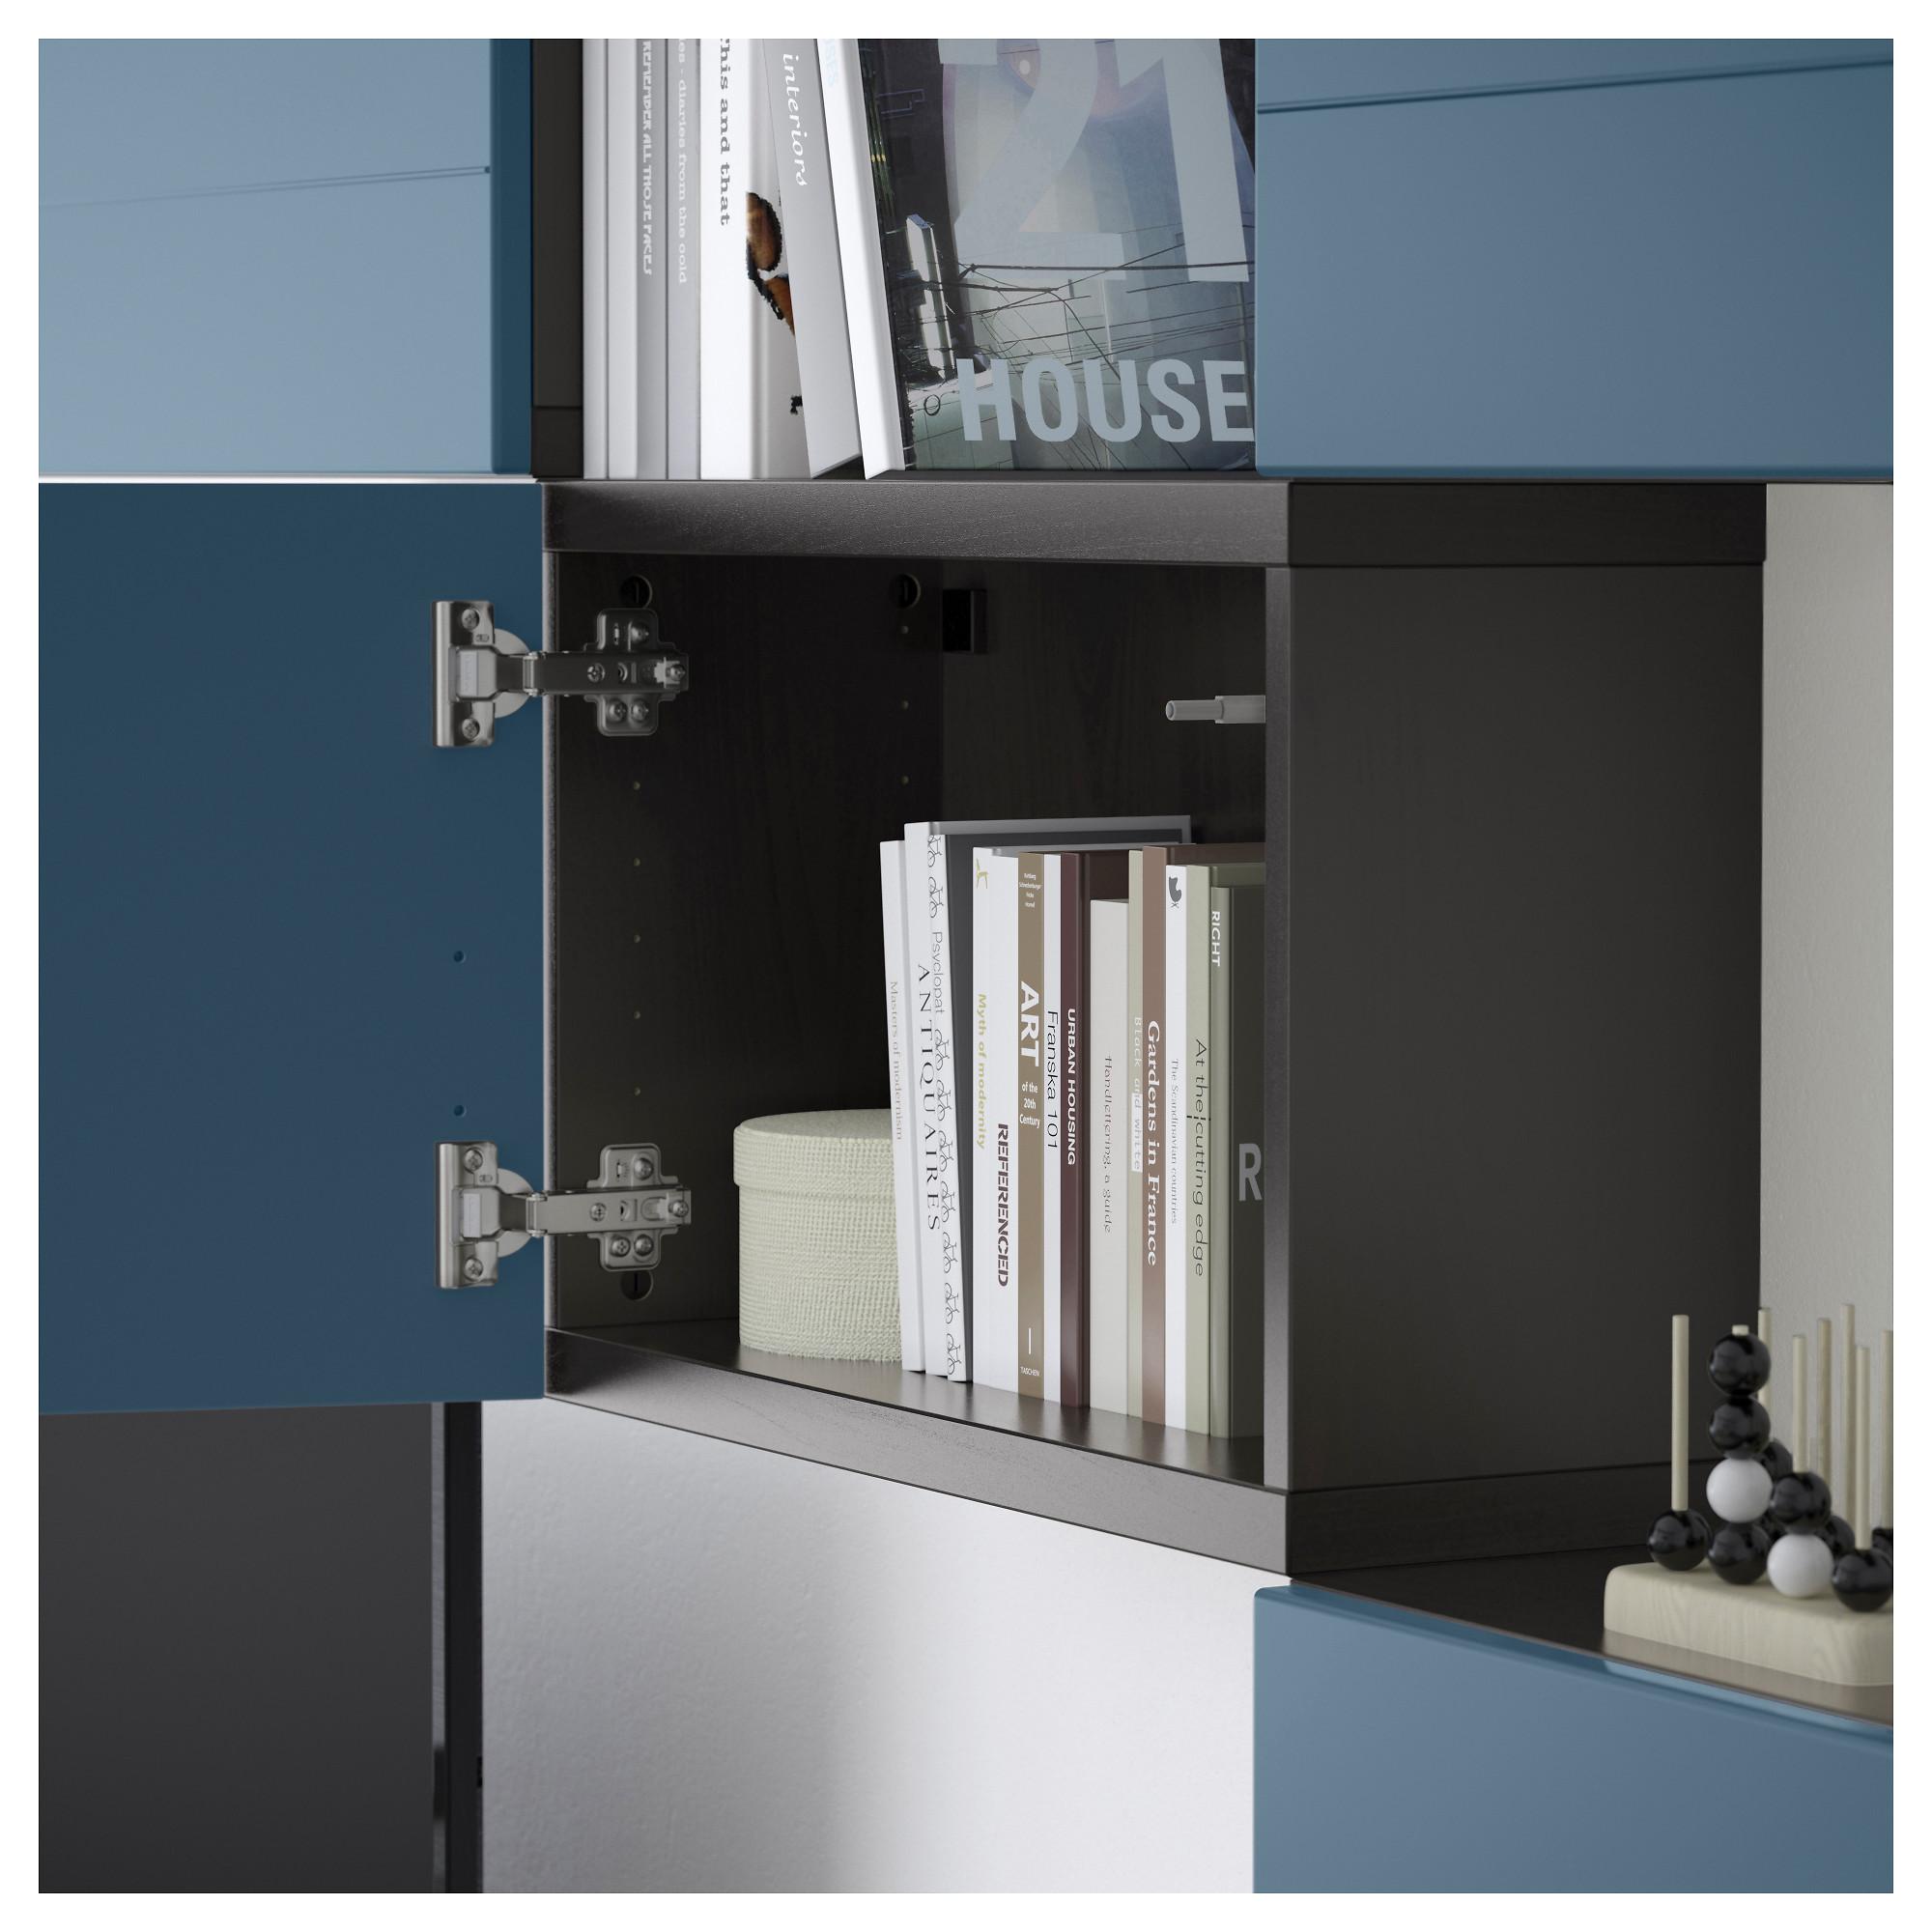 Шкаф для ТВ, комбинация БЕСТО темно-синий артикуль № 292.761.21 в наличии. Онлайн каталог IKEA Минск. Быстрая доставка и установка.